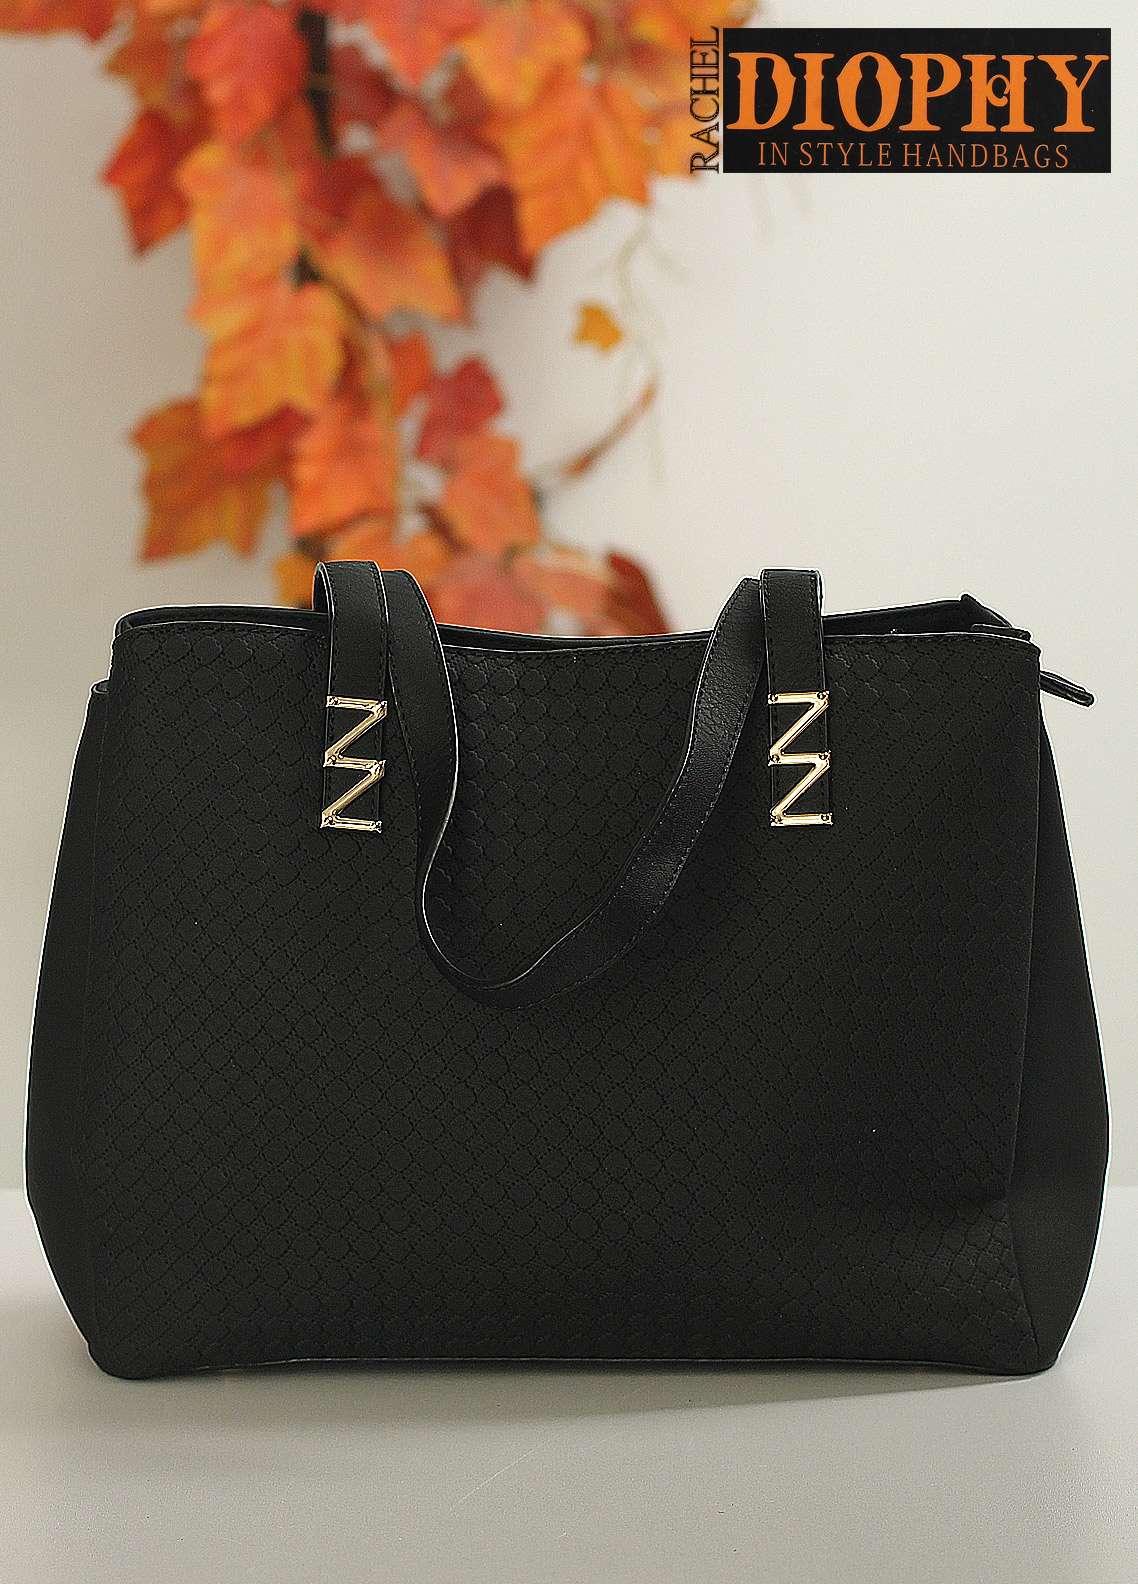 Rachel Diophy PU Leather Satchels Handbags for Women - Black with Plain Textured